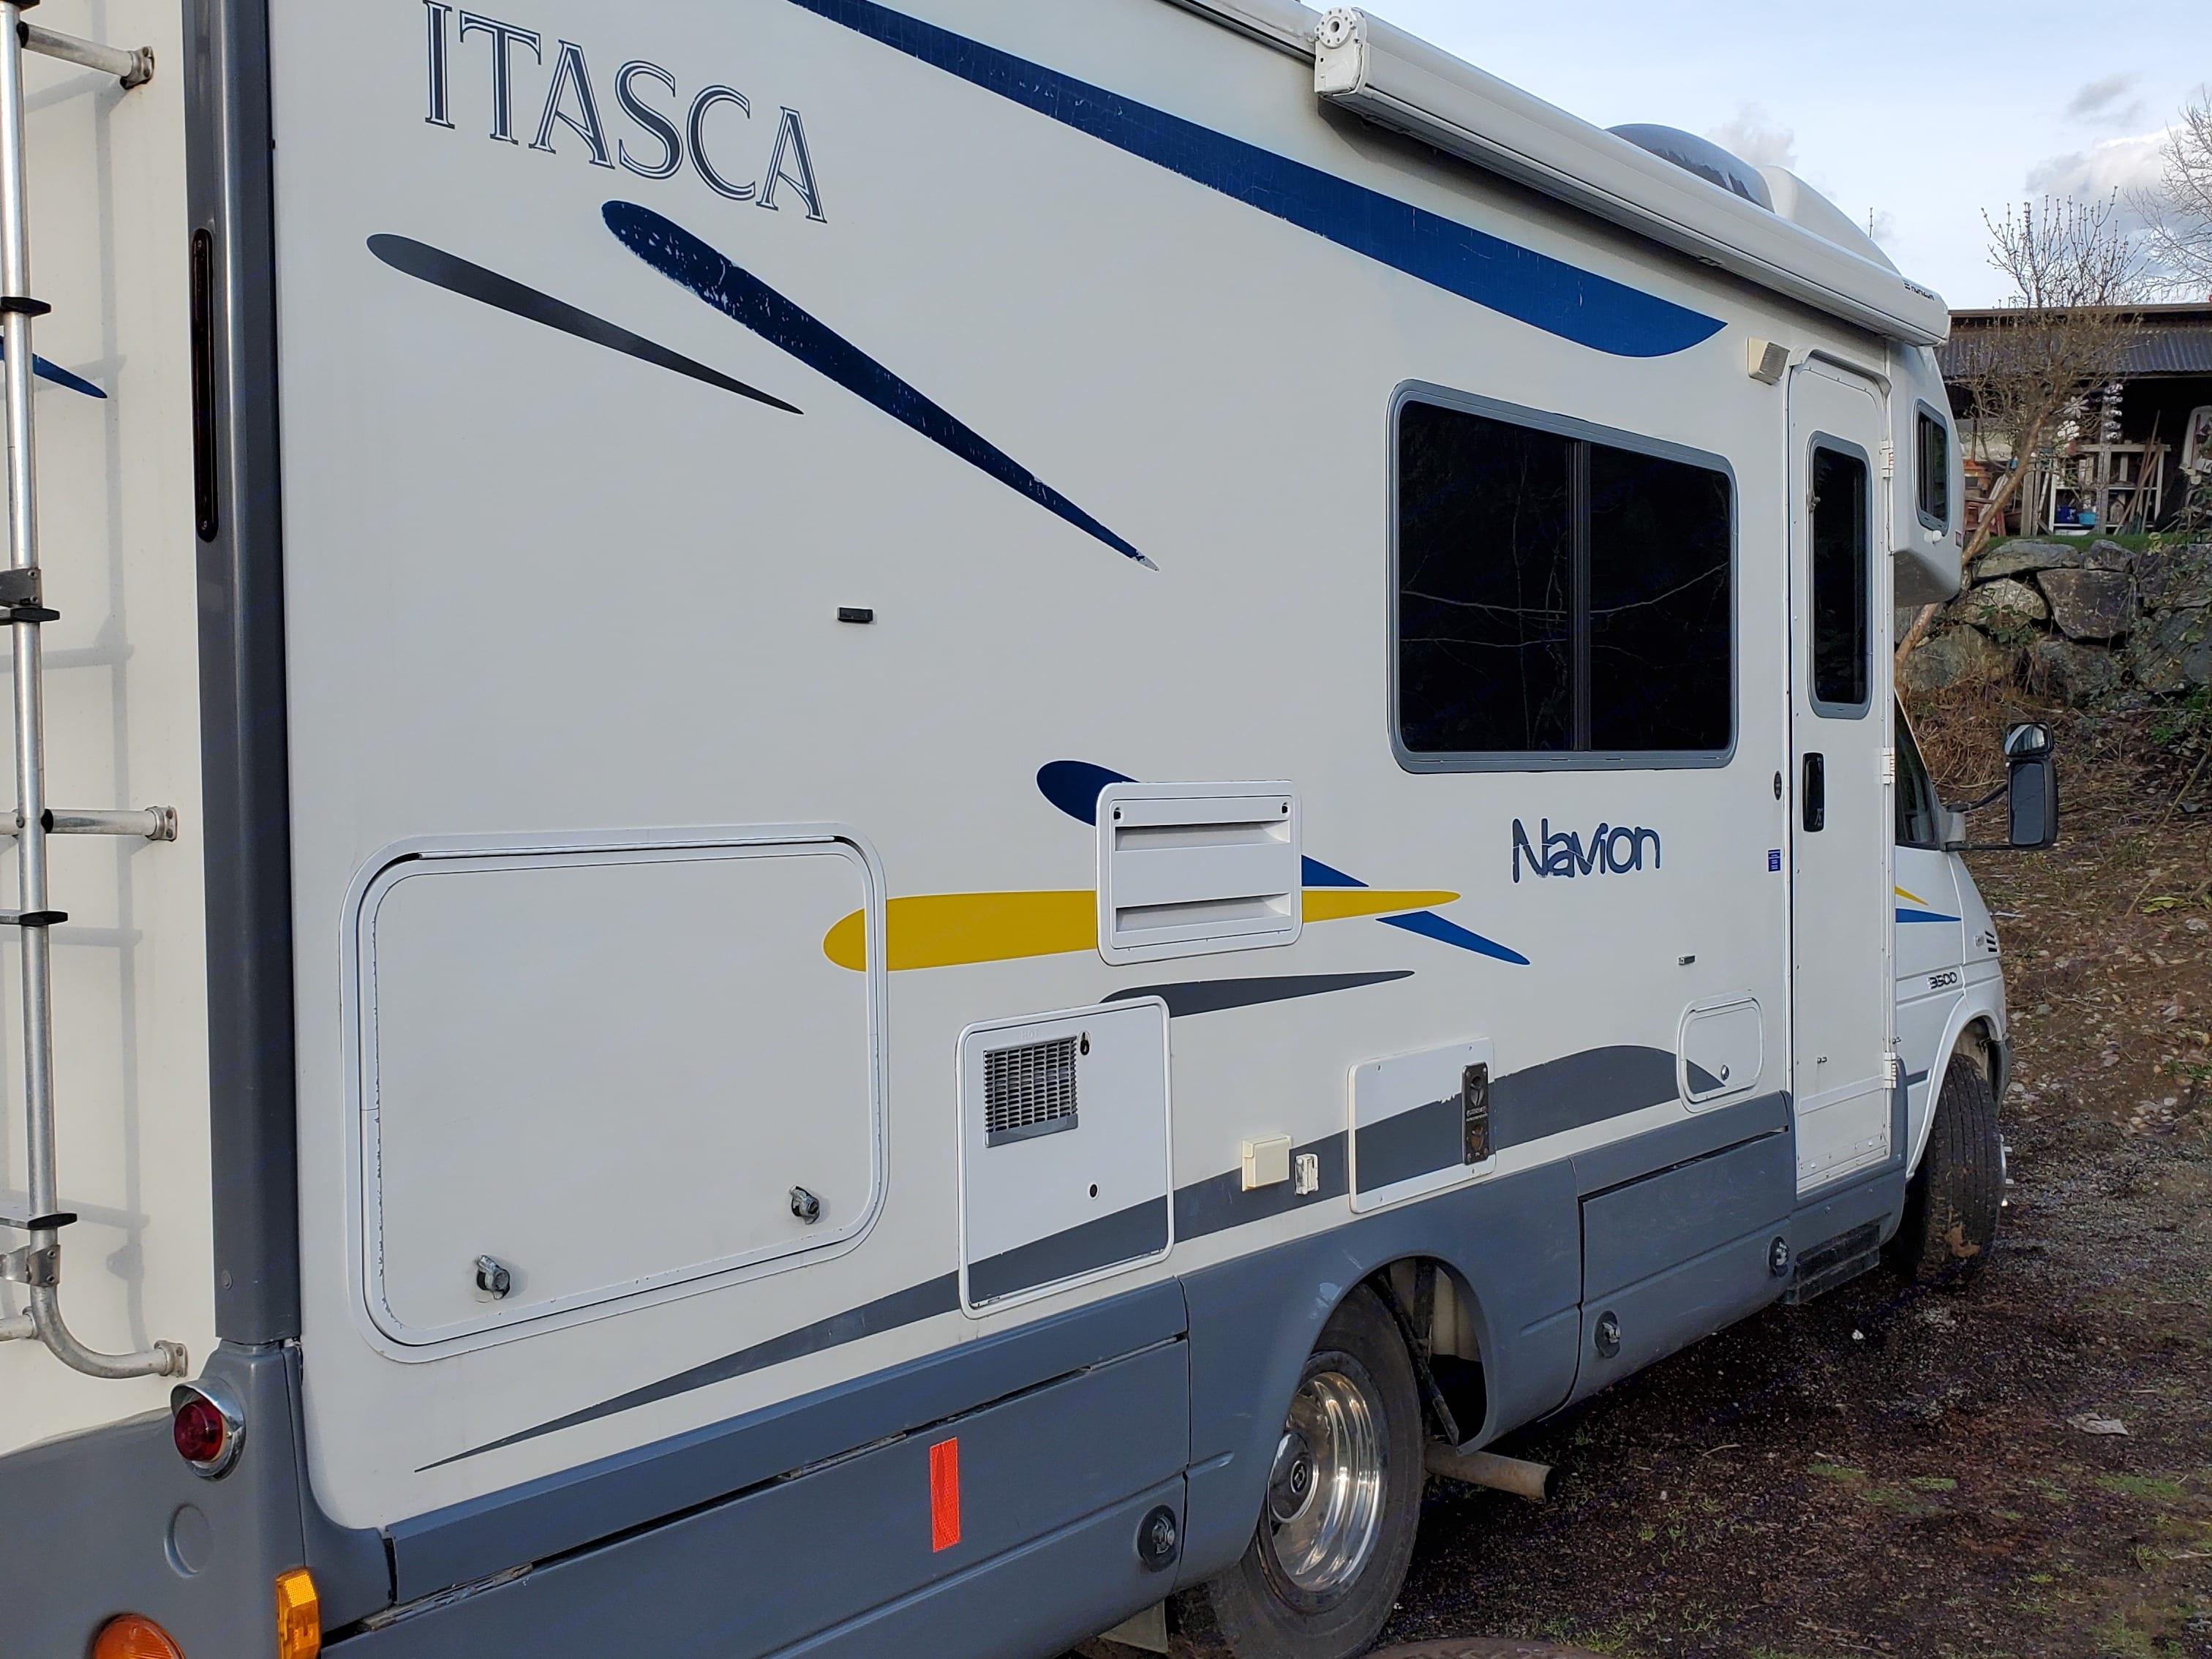 Itasca Navion 2006